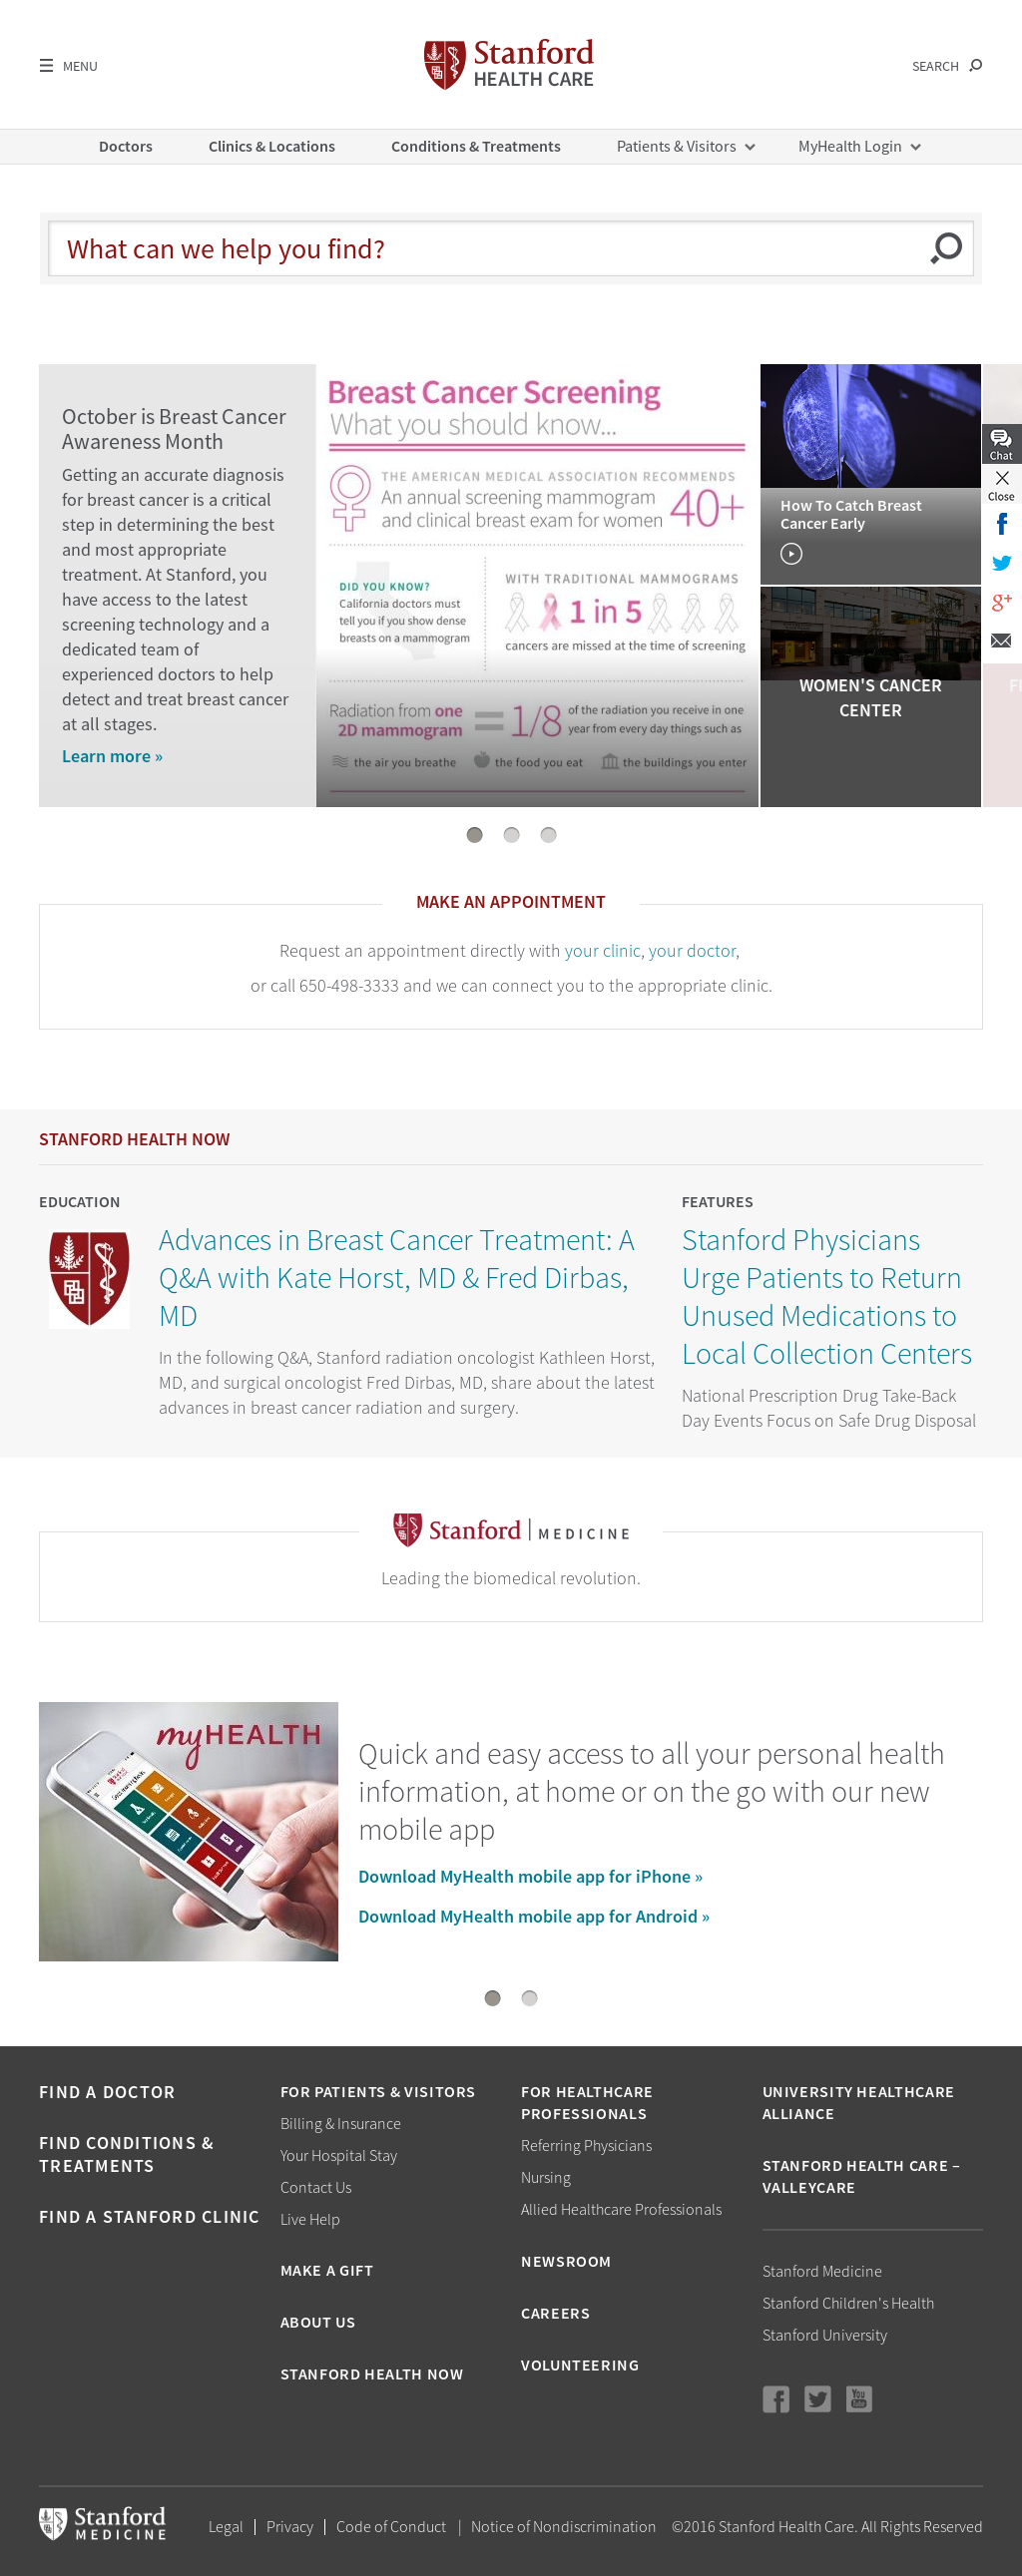 SHC Competitors, Revenue and Employees - Owler Company Profile